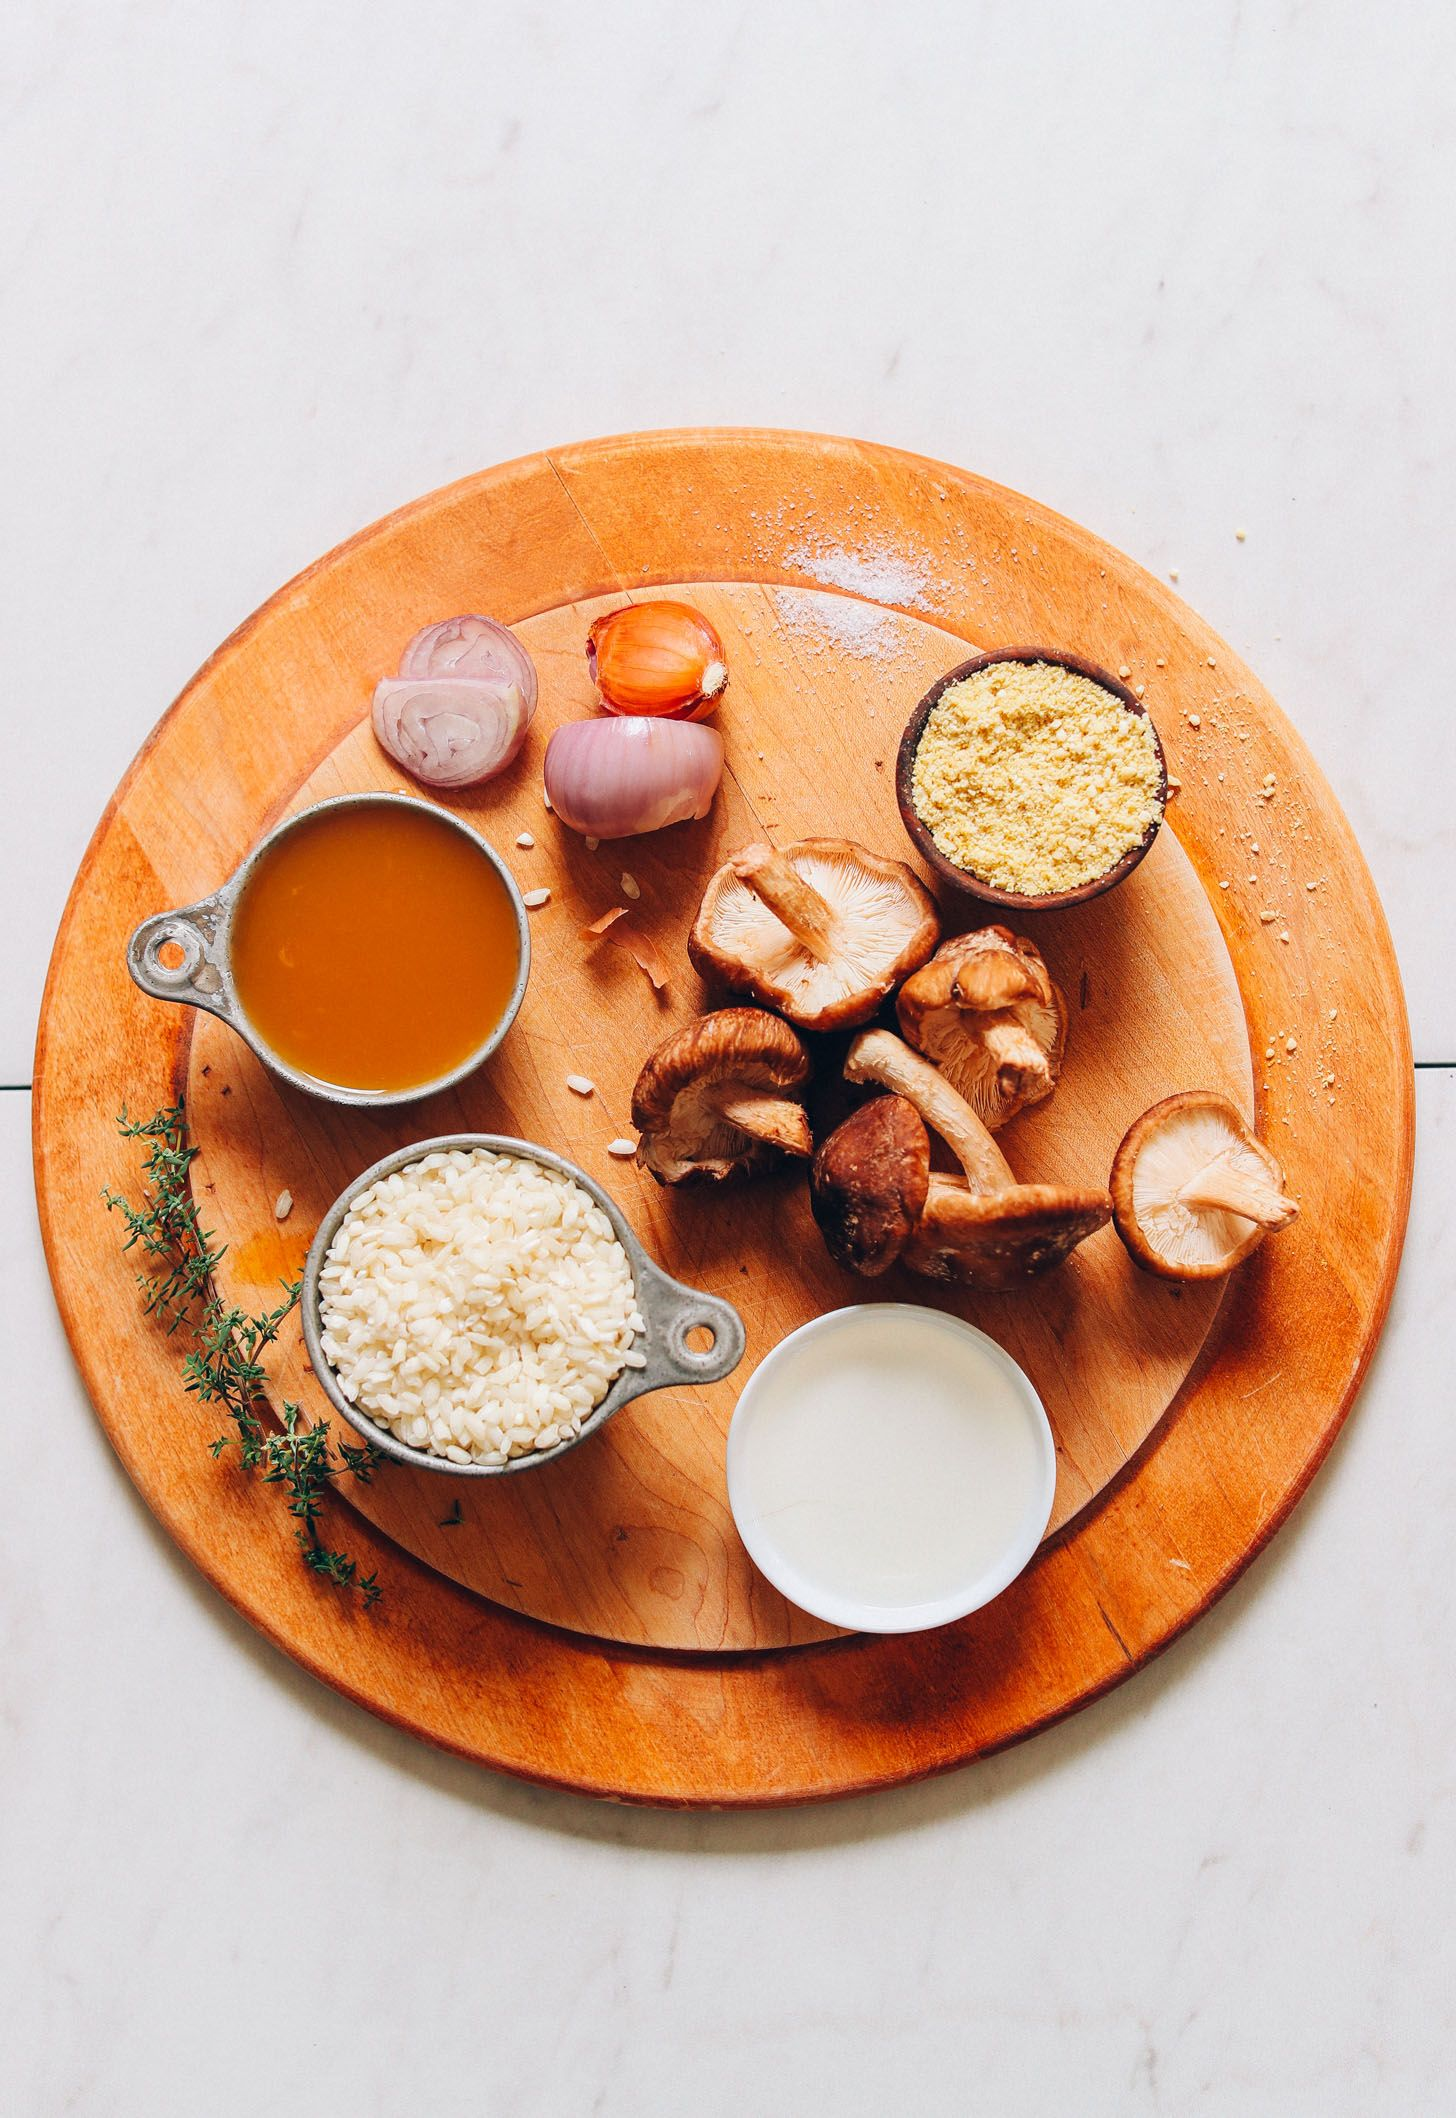 Caramelized Shiitake Mushroom Risotto Recipe Stuffed Mushrooms Mushroom Risotto Baker Recipes